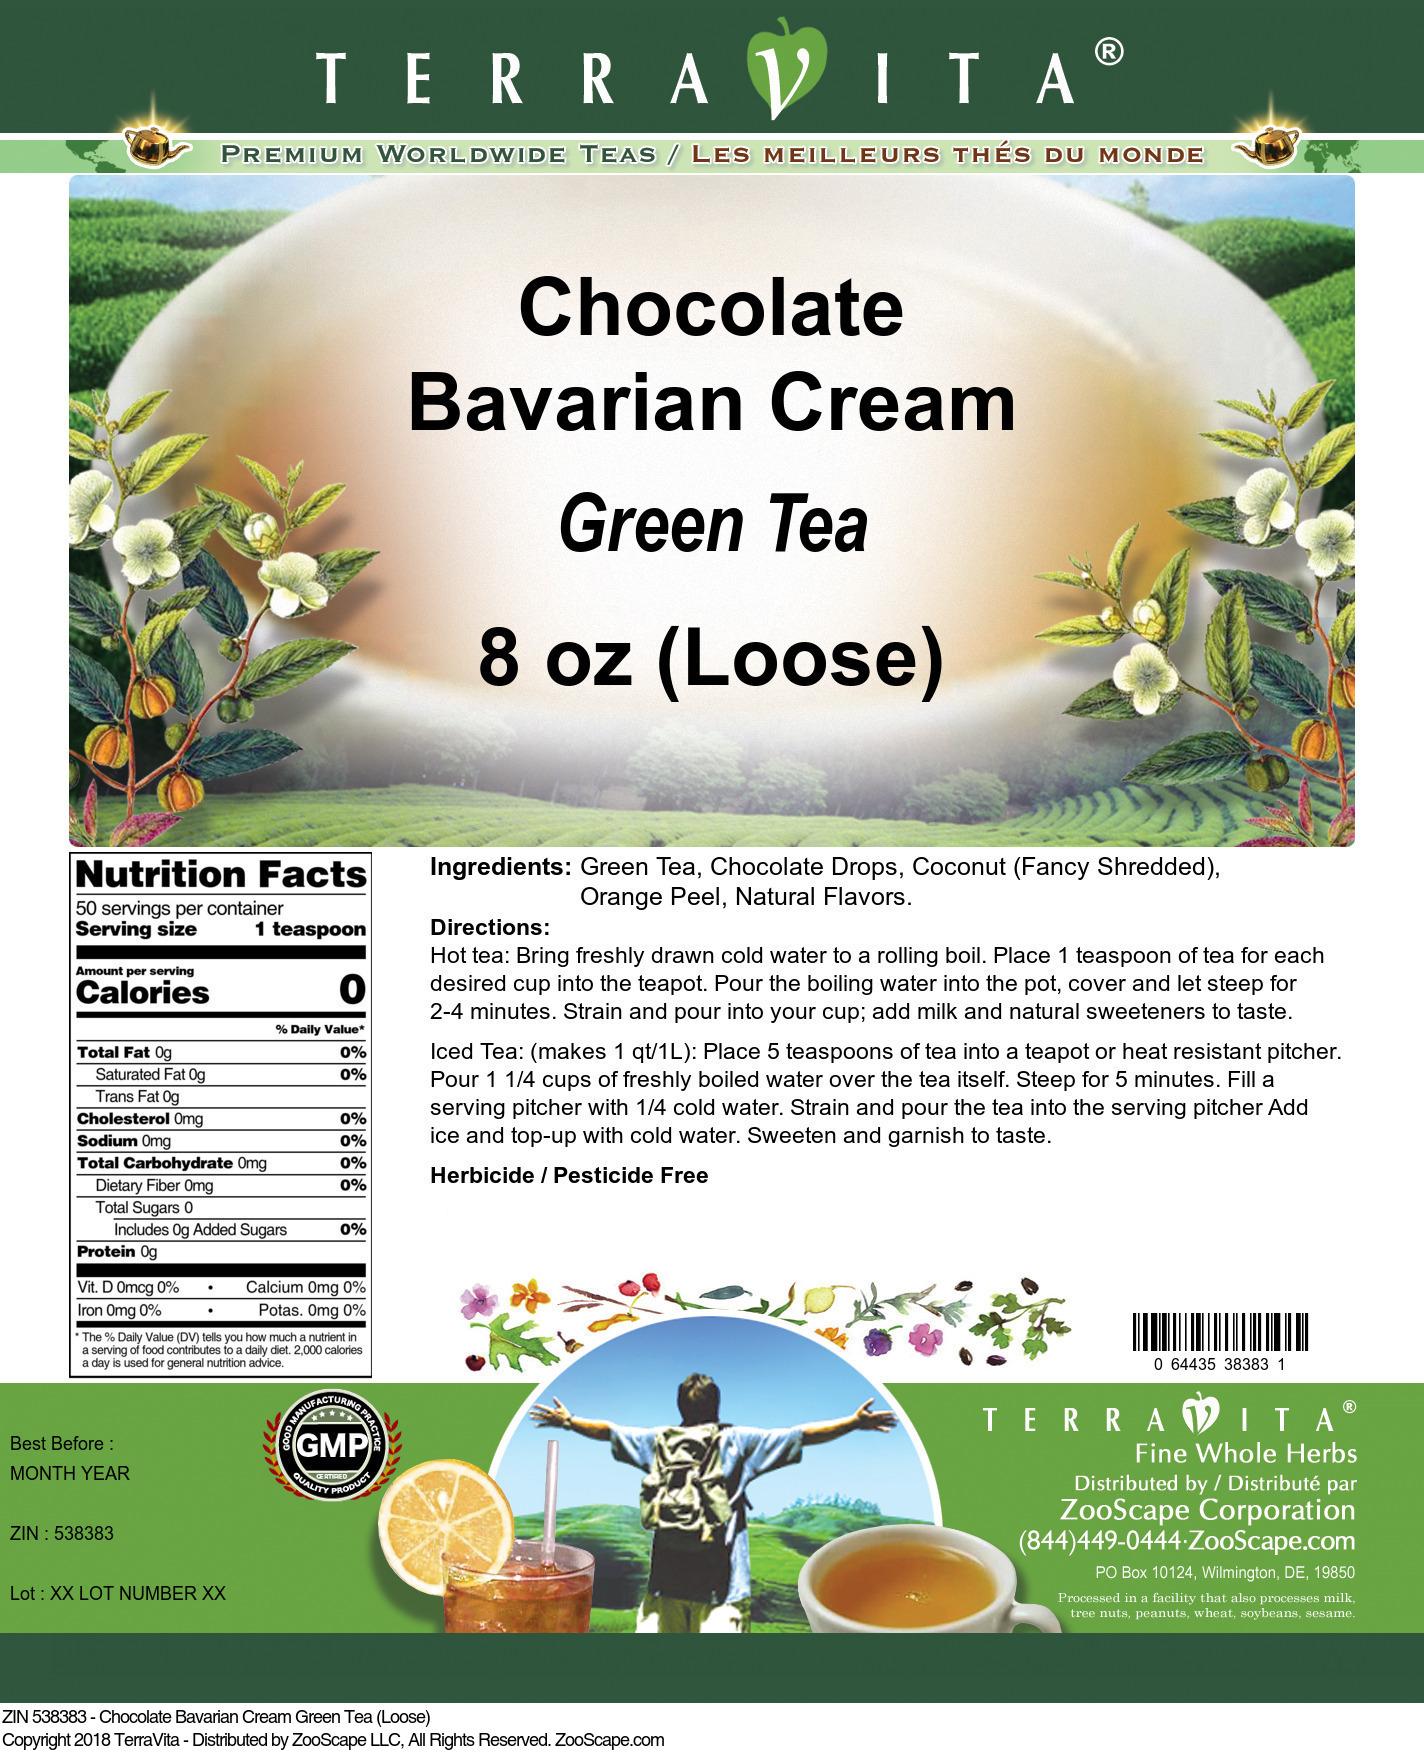 Chocolate Bavarian Cream Green Tea